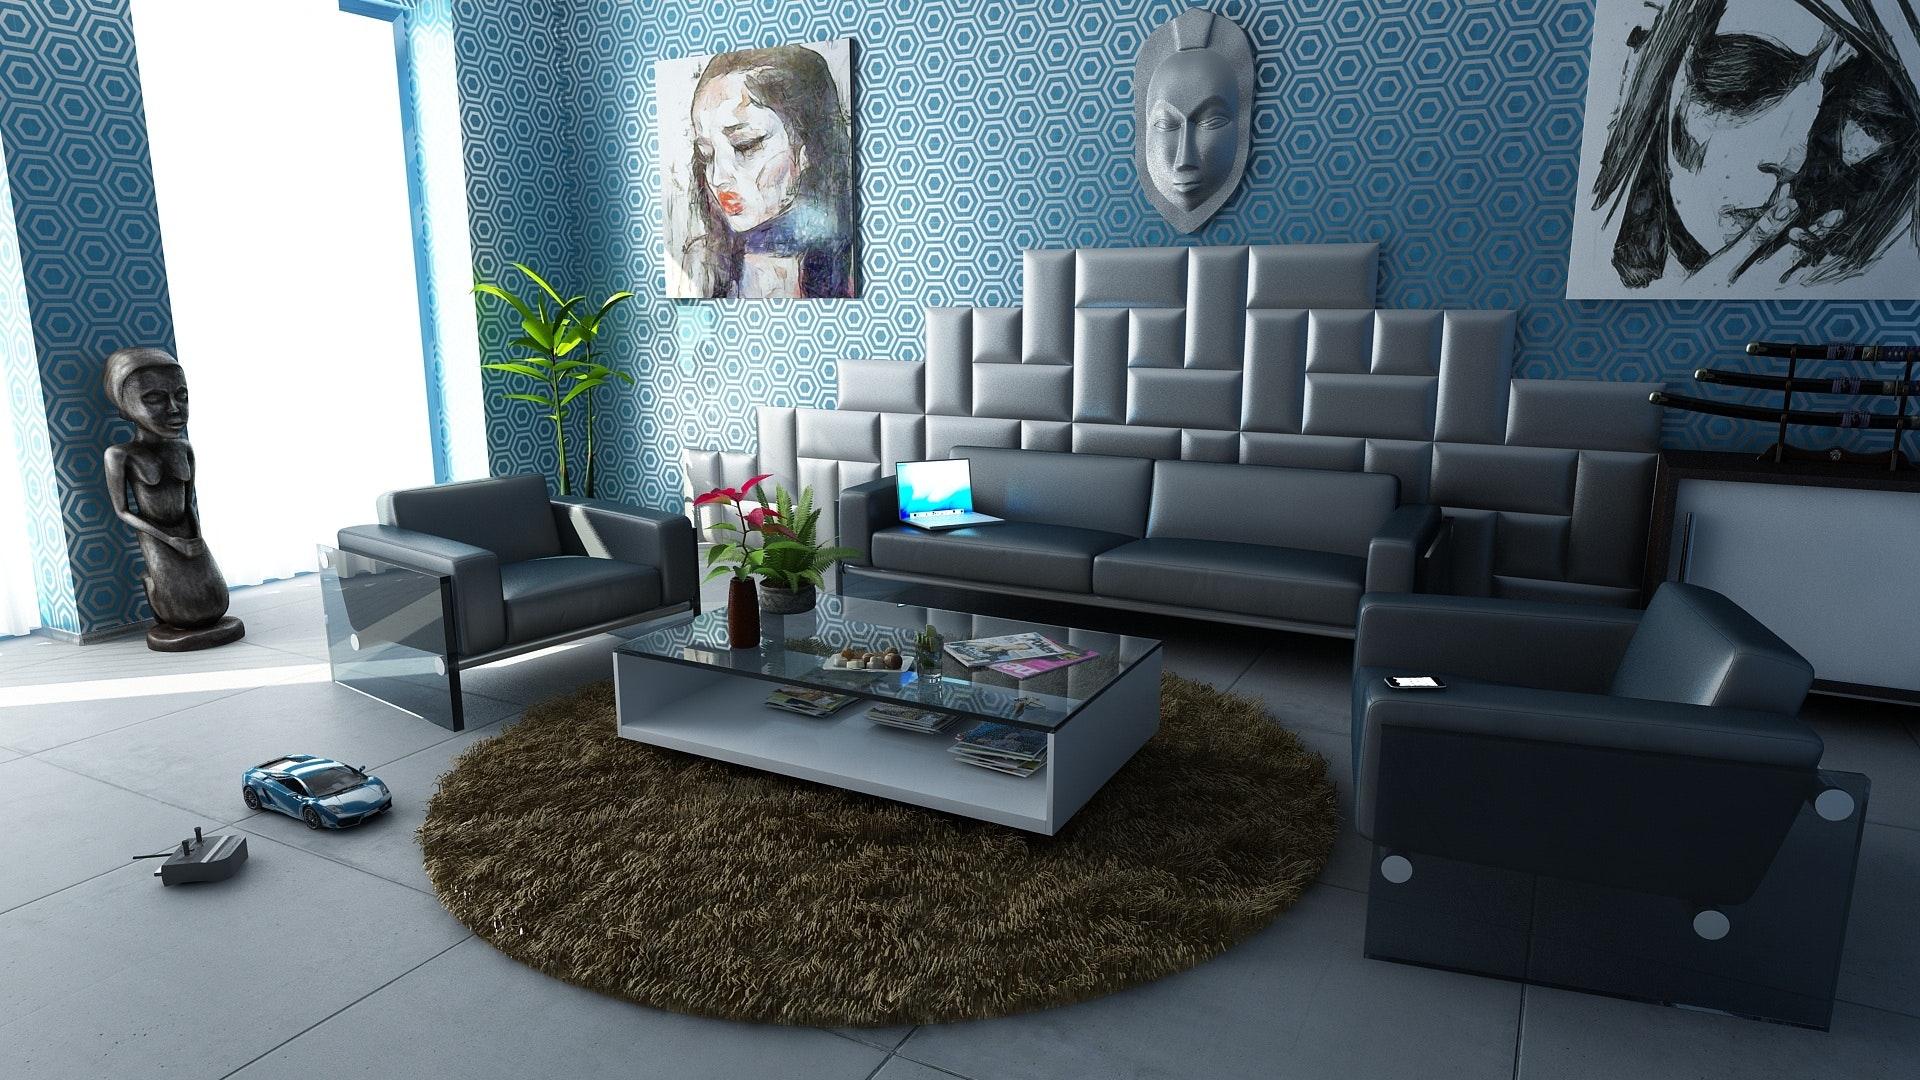 https://www.furnstyl.com/skin/frontend/ultimo/default/interiors/View02.jpg